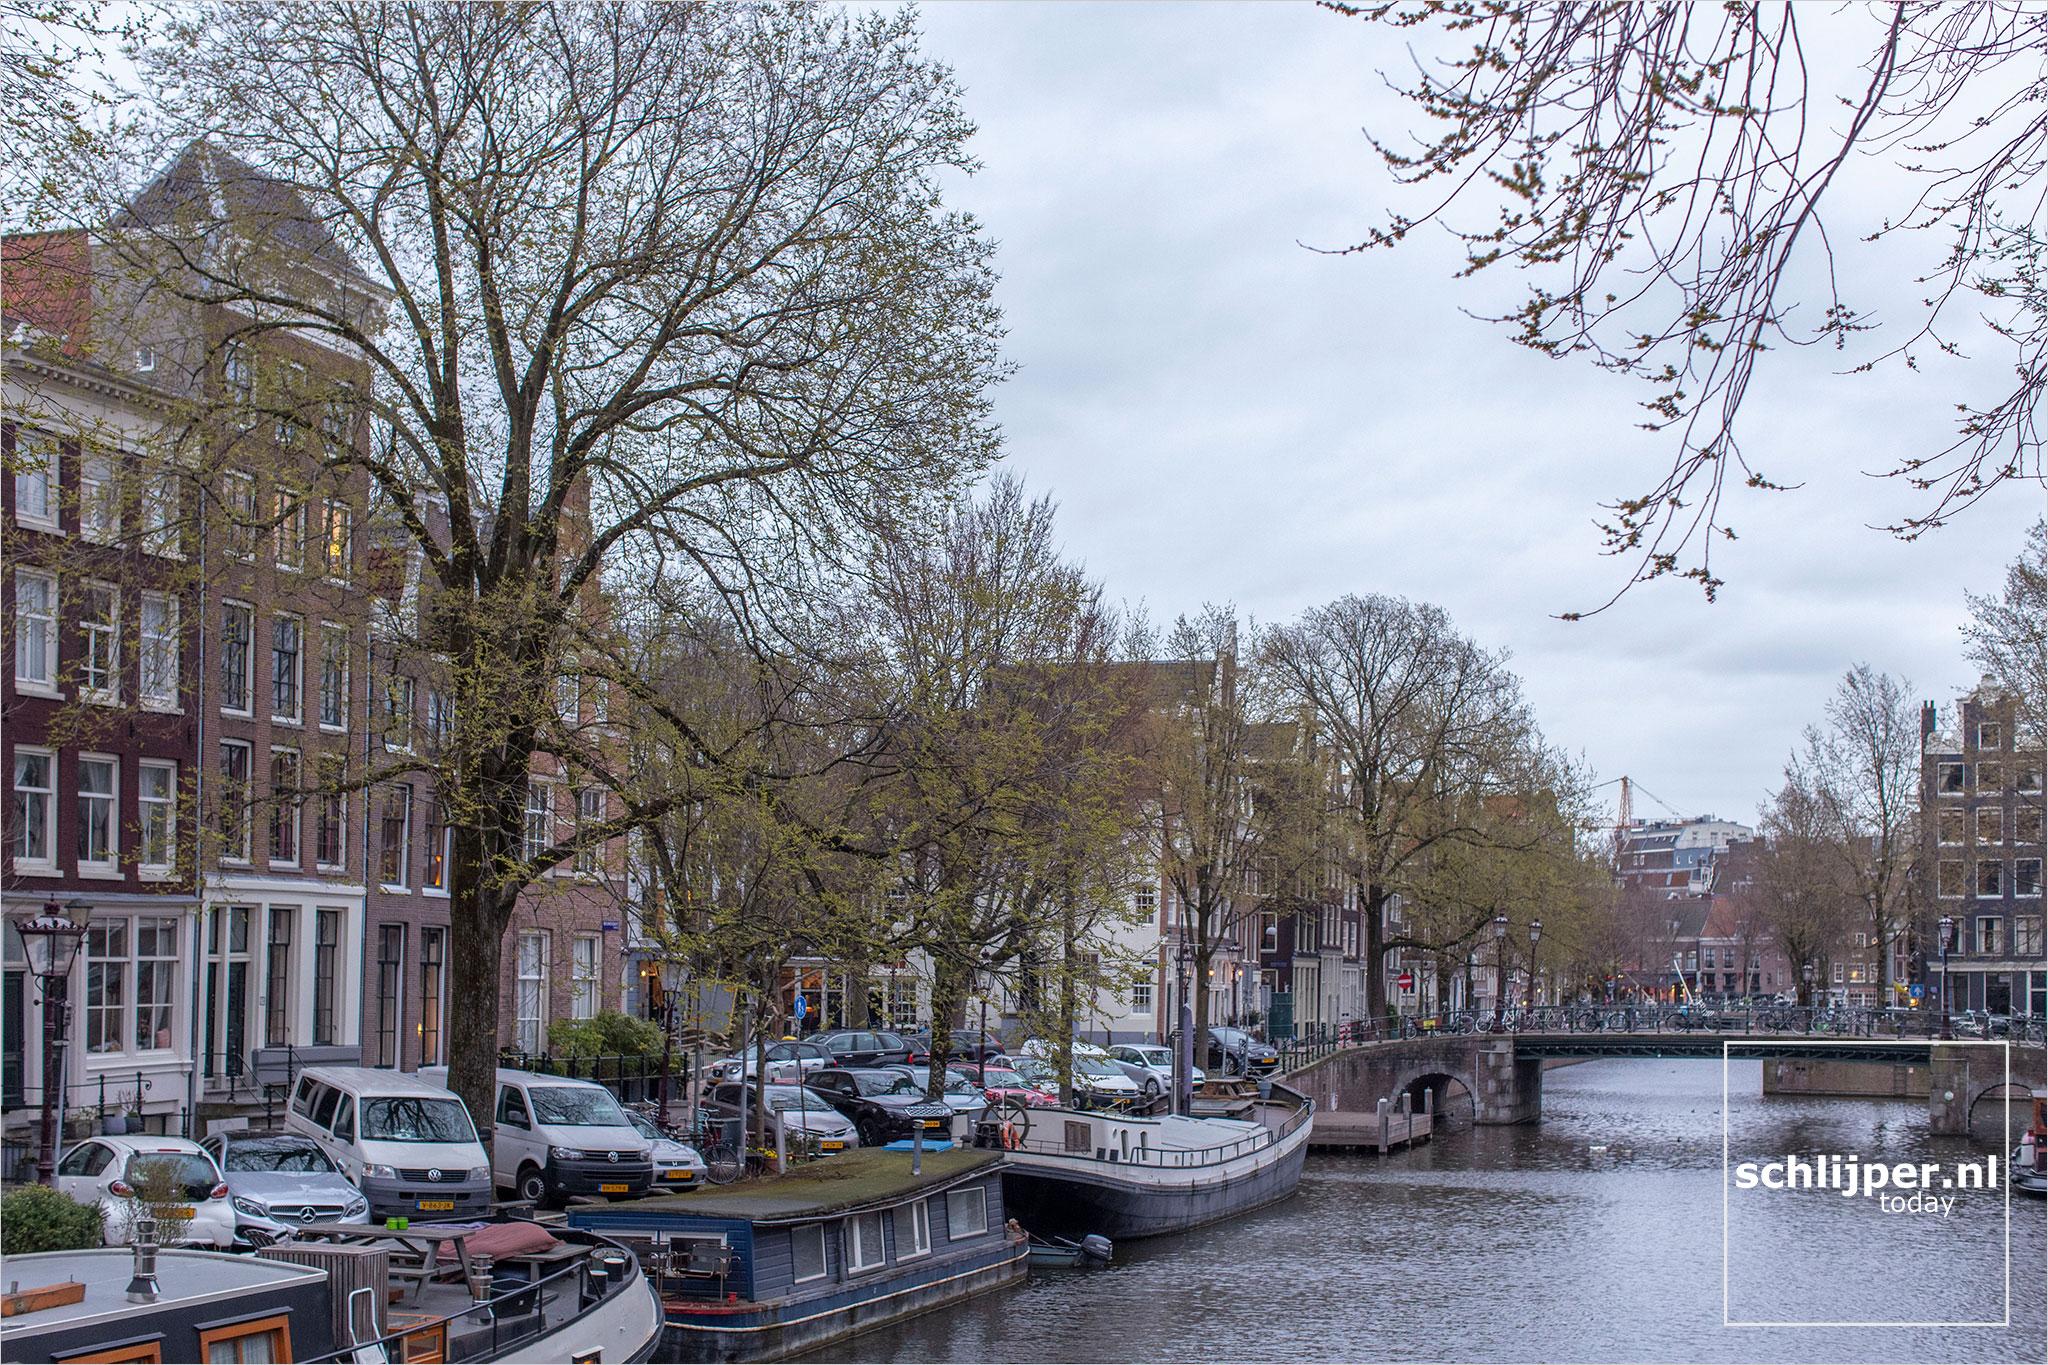 The Netherlands, Amsterdam, 28 maart 2021